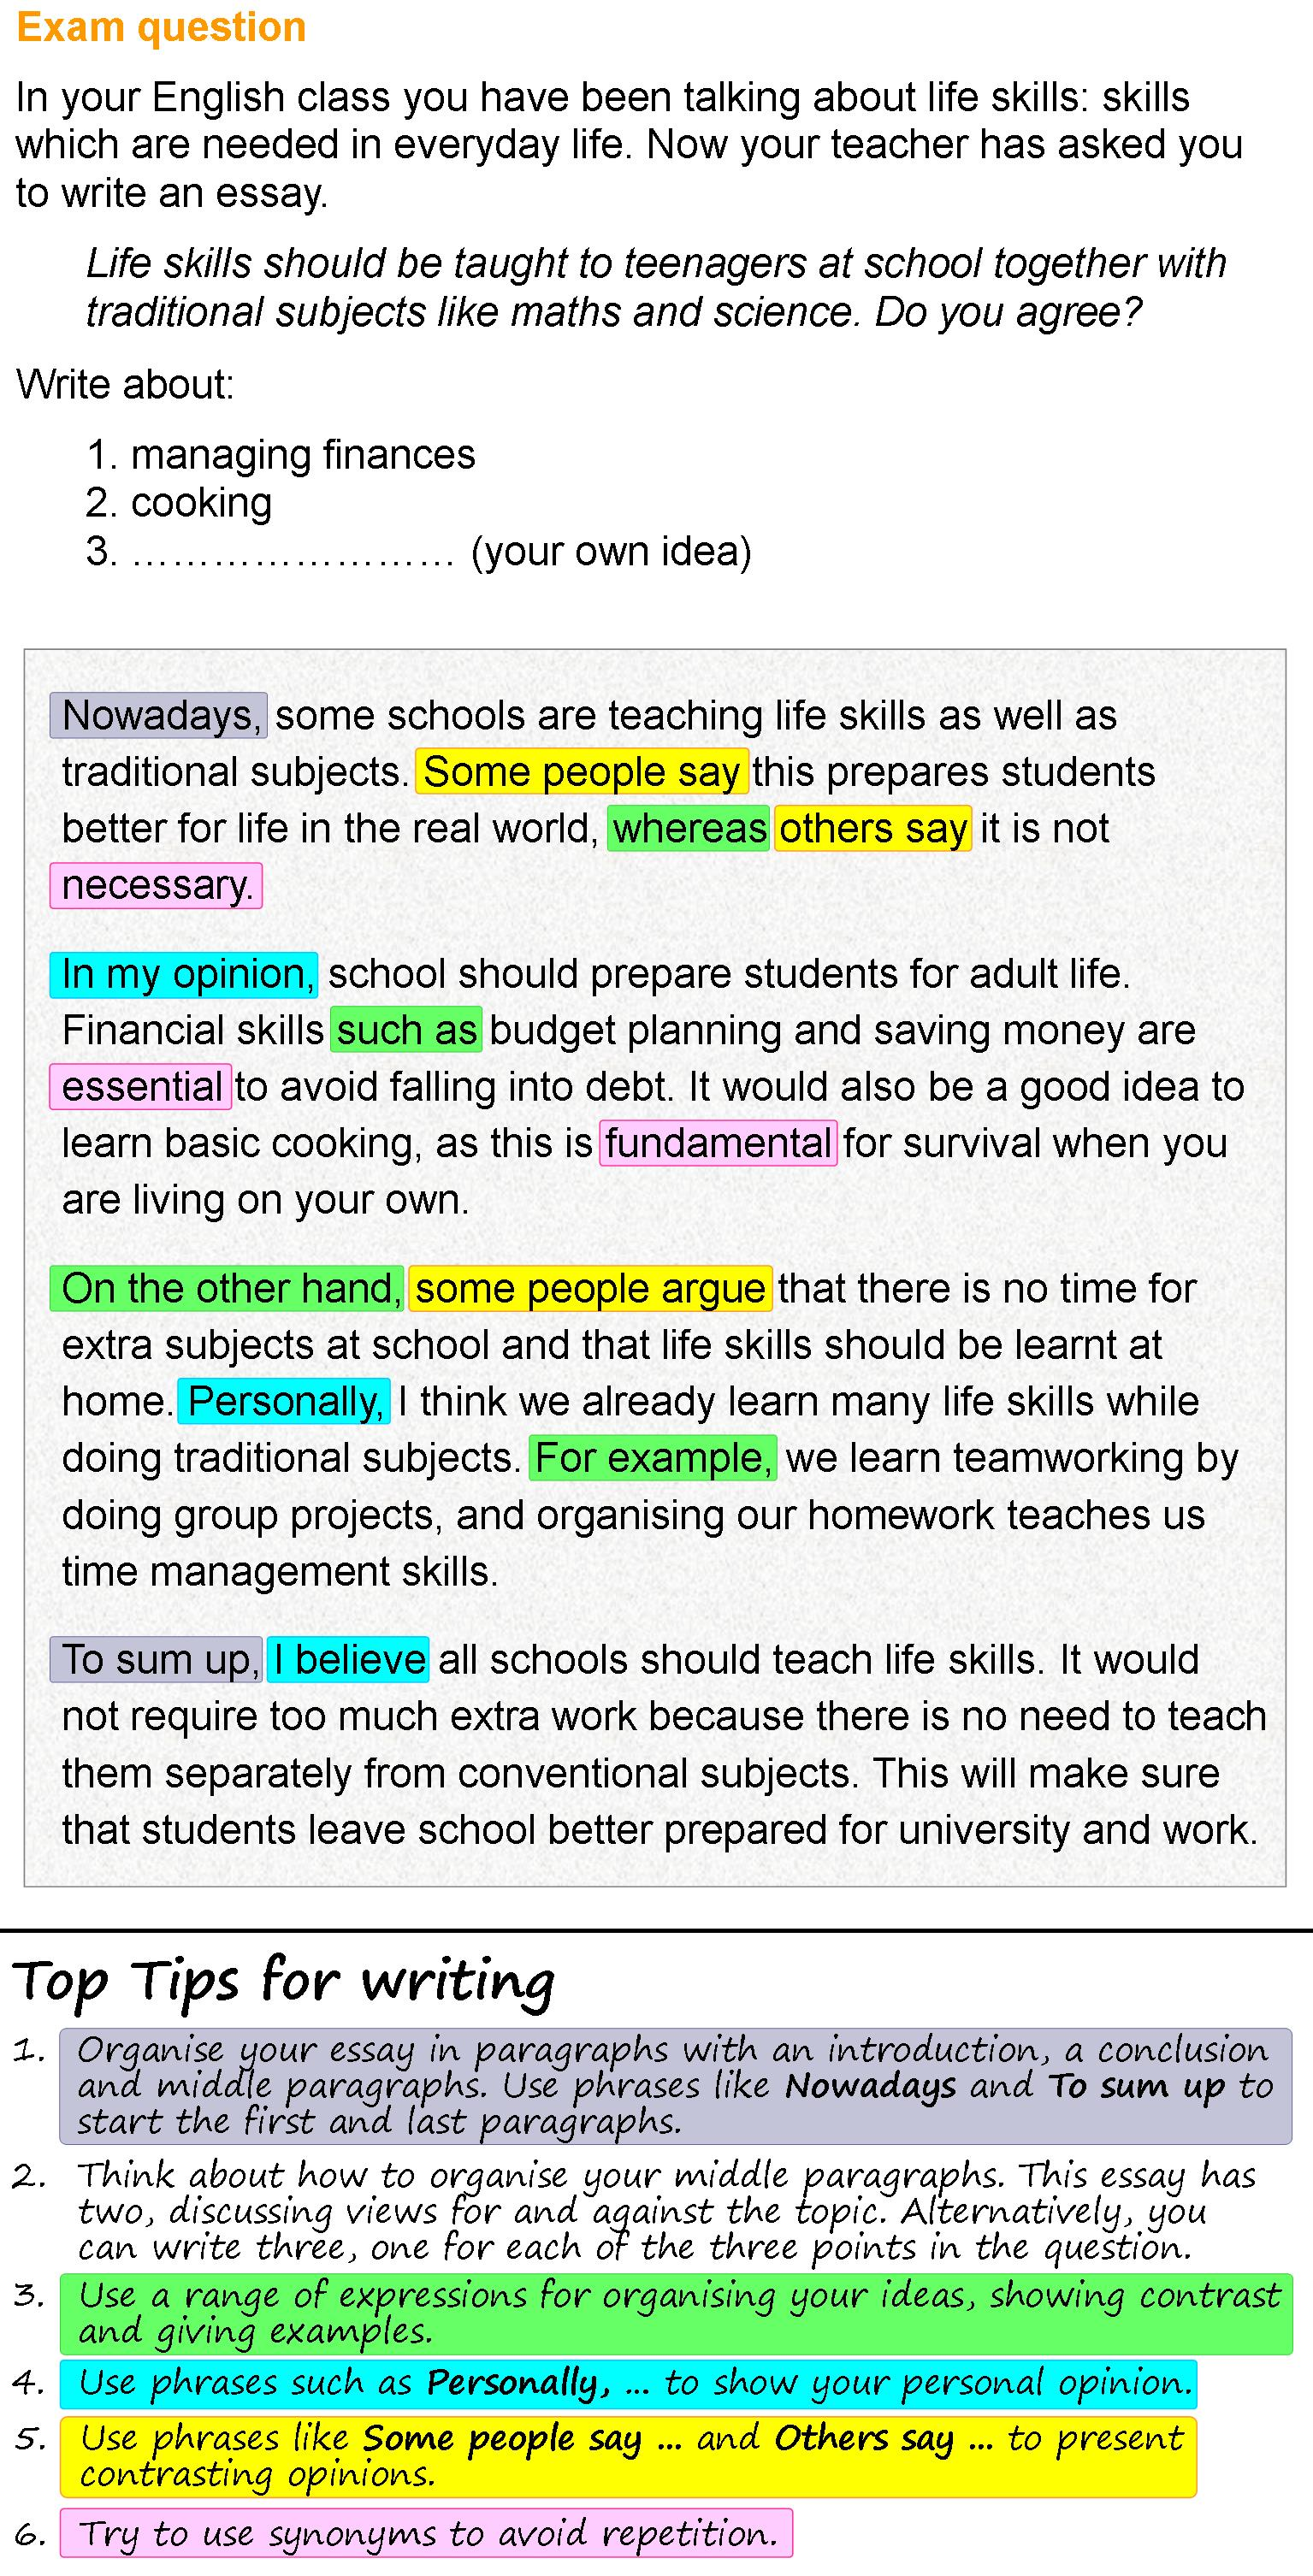 006 Essay Writing On Examination Day Life Skills 1 Rare Full